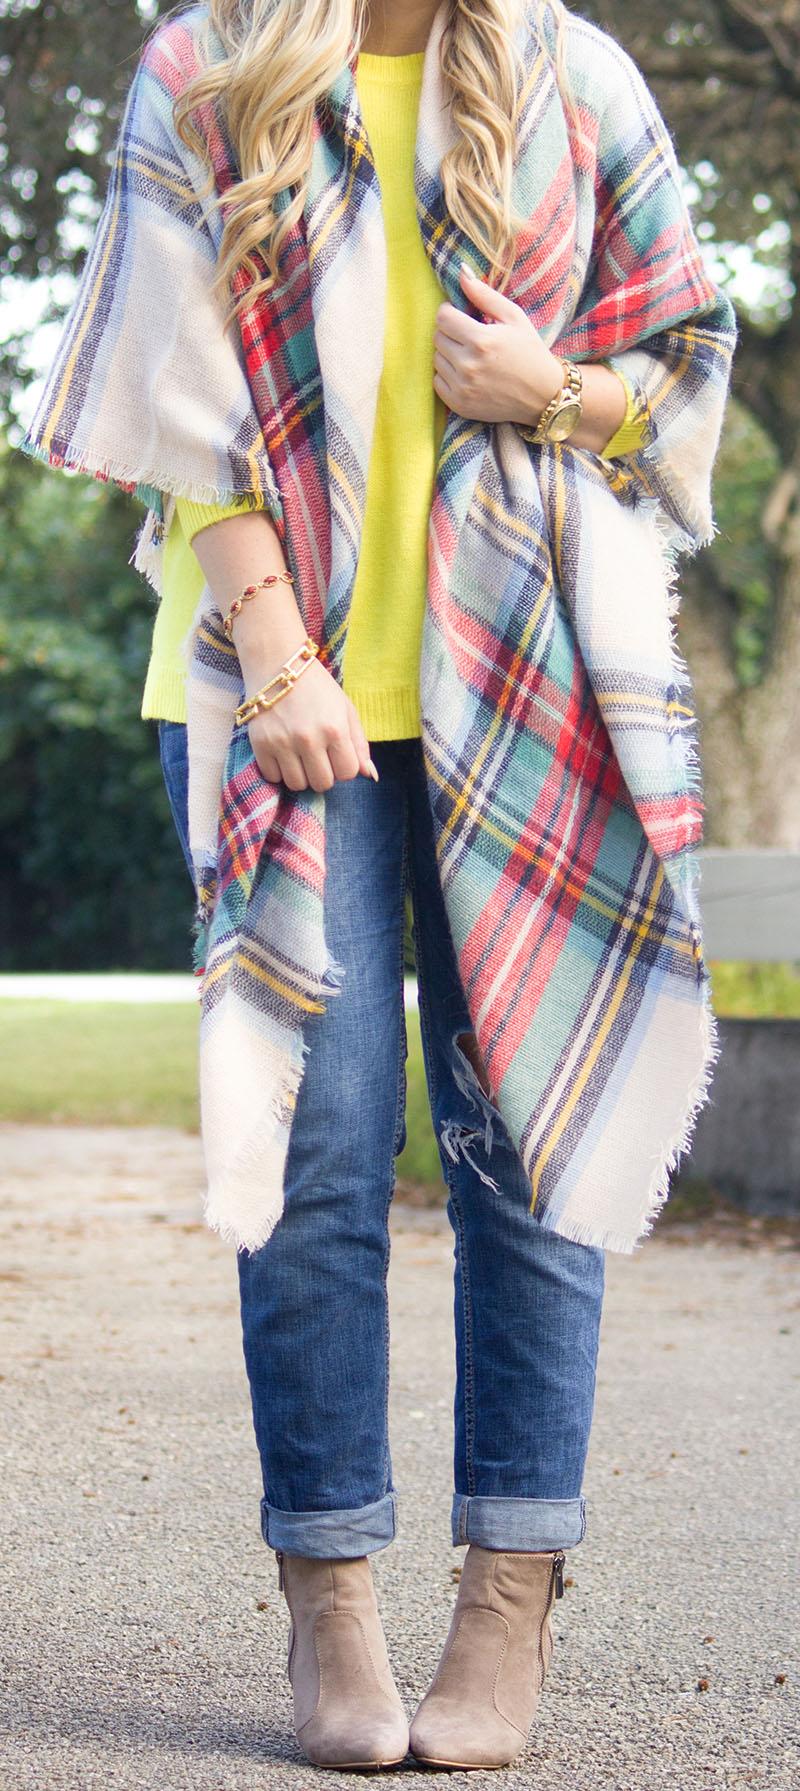 Neon Yellow Sweater + Blanket Scarf